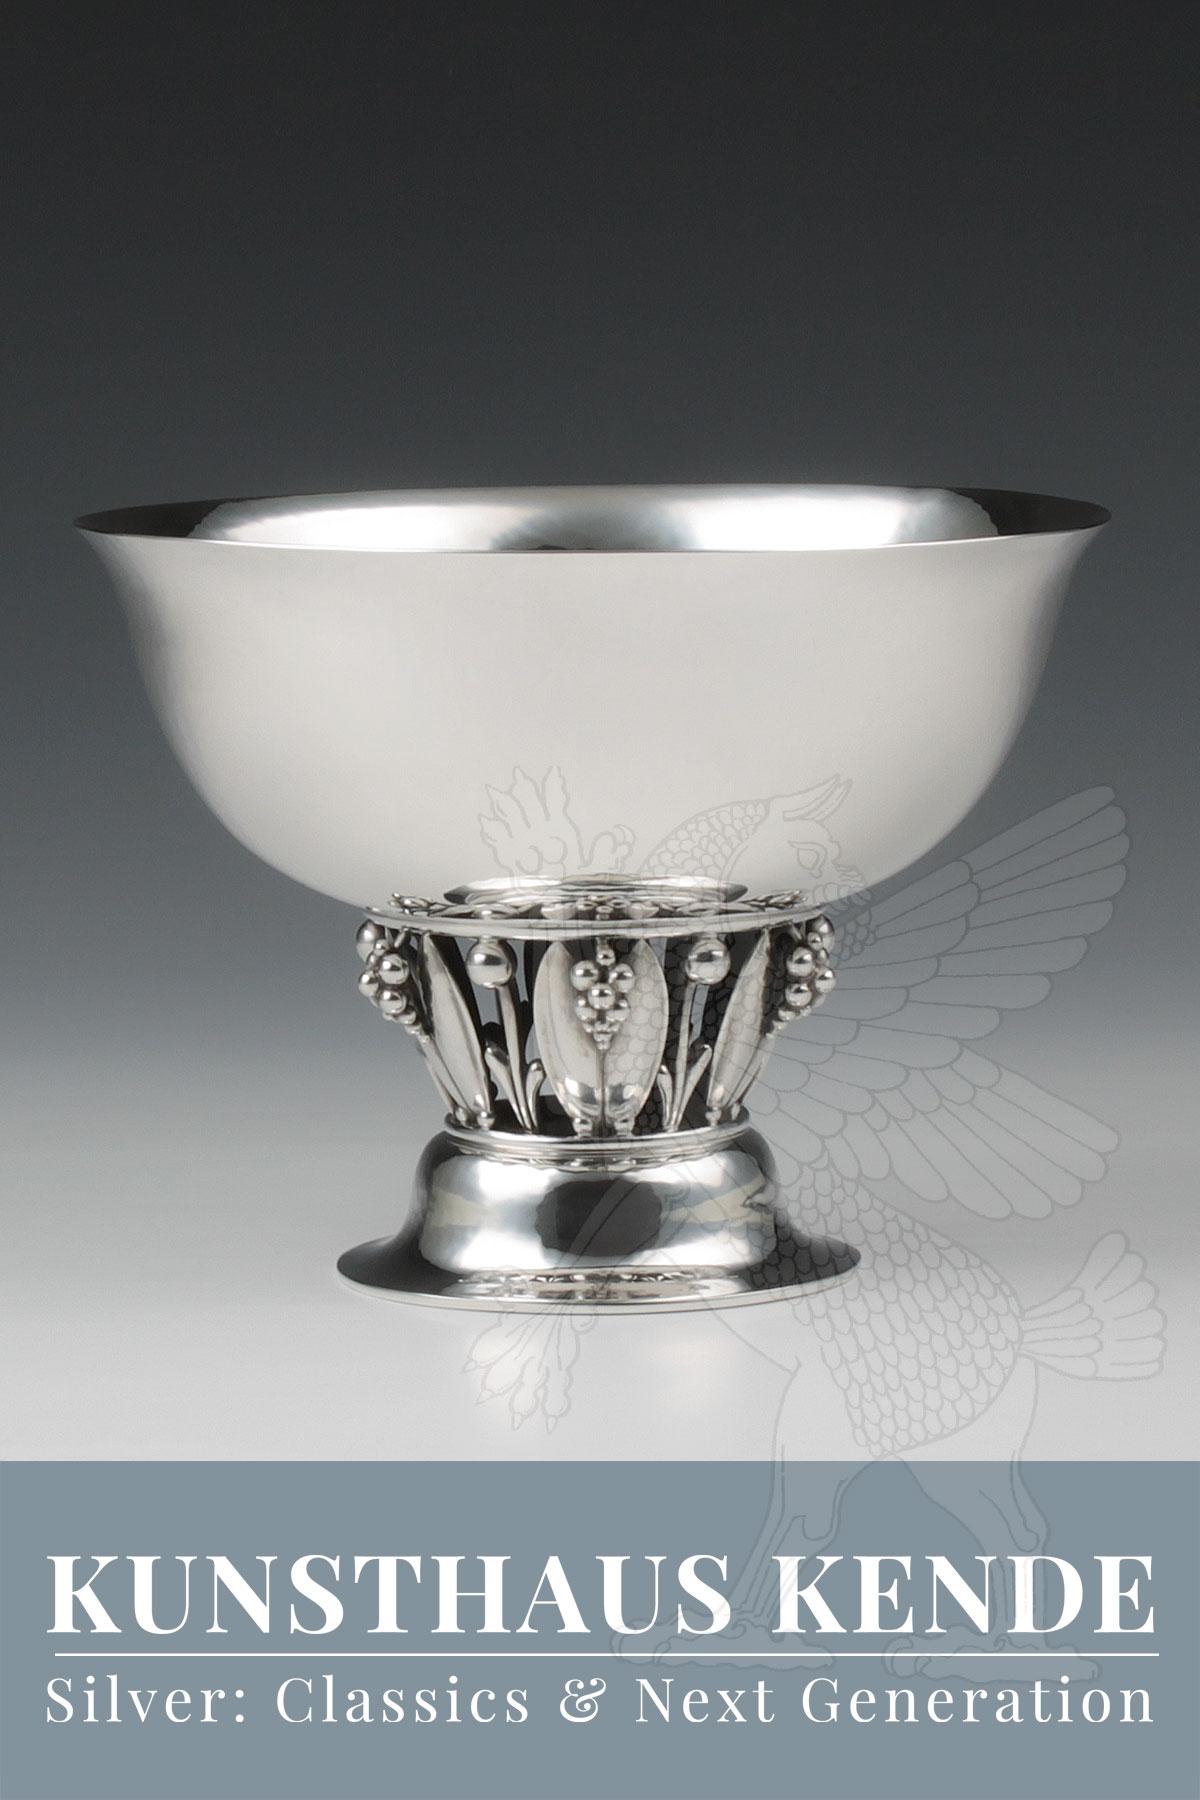 Georg Jensen Sterling Silber Schale Fußschale sterling silver Johan Rohde Louvre